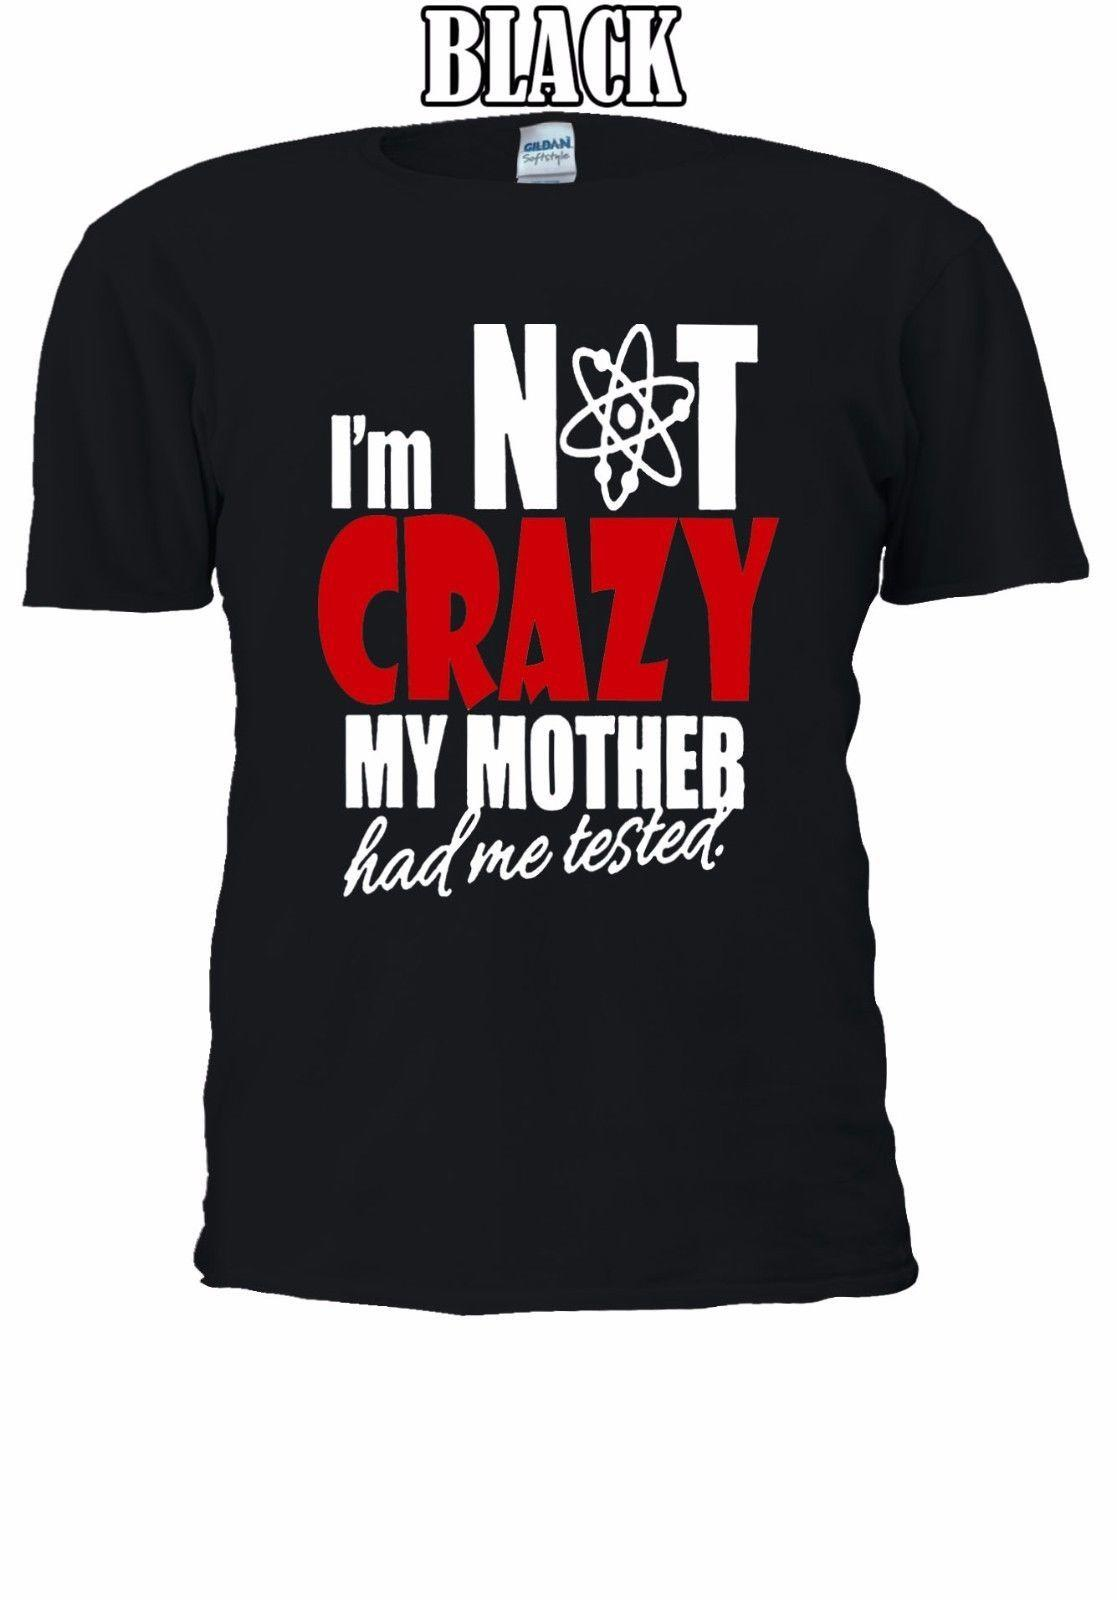 The Big Bang Theory Fun Quotes Crazy T Shirt Vest Men Women Unisex 416 Free Shipping Harajuku Tops Fashion Classic Unique